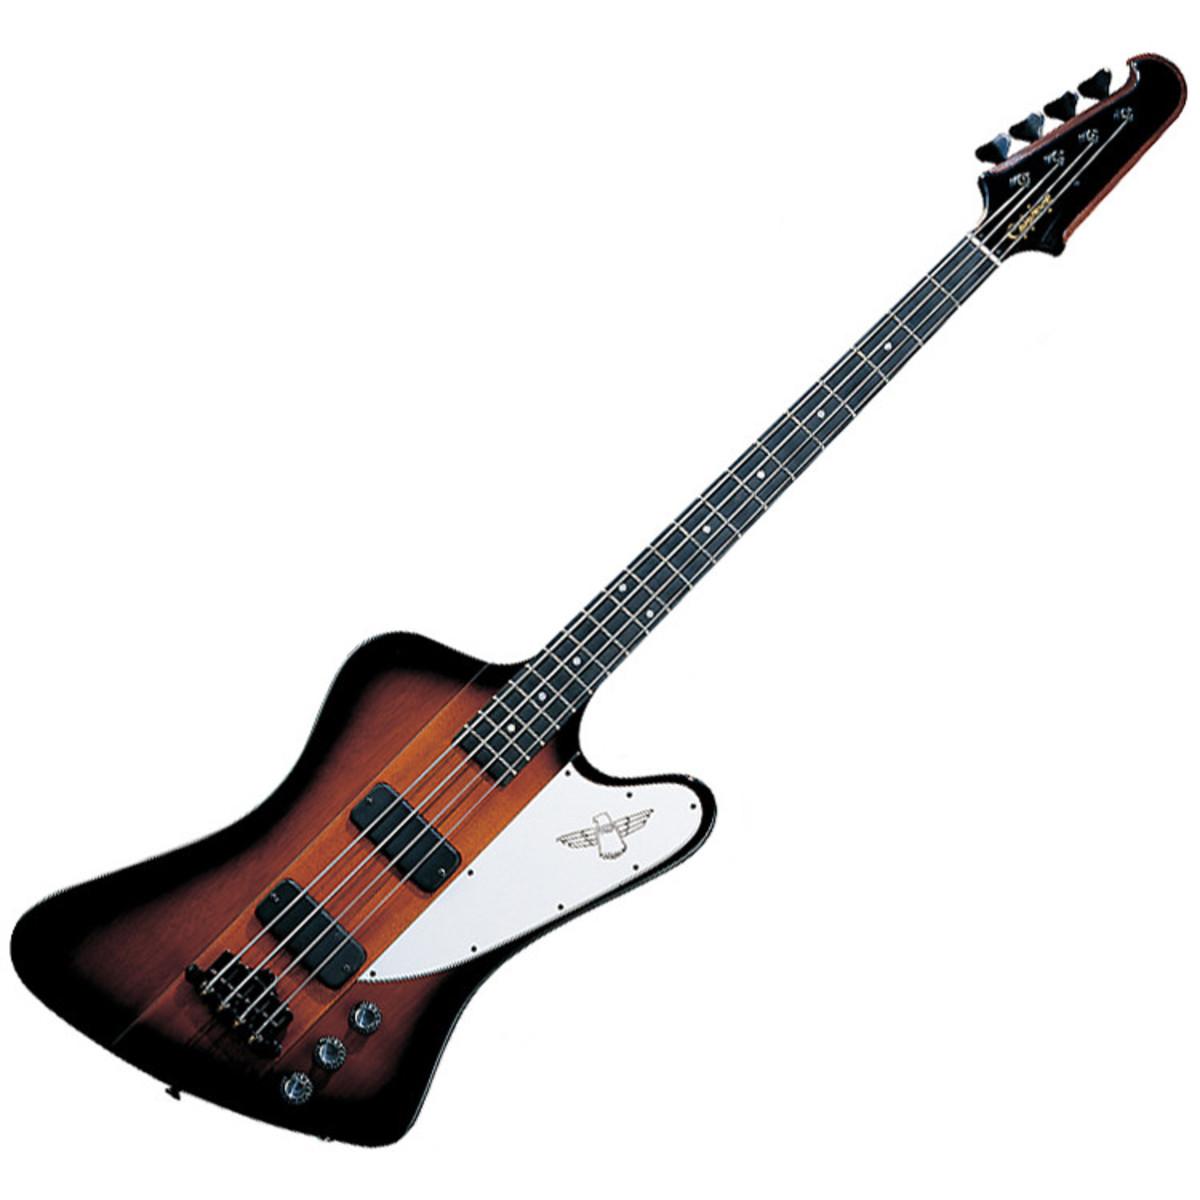 epiphone thunderbird classic iv pro bass guitar vintage sunburst box opened at gear4music. Black Bedroom Furniture Sets. Home Design Ideas